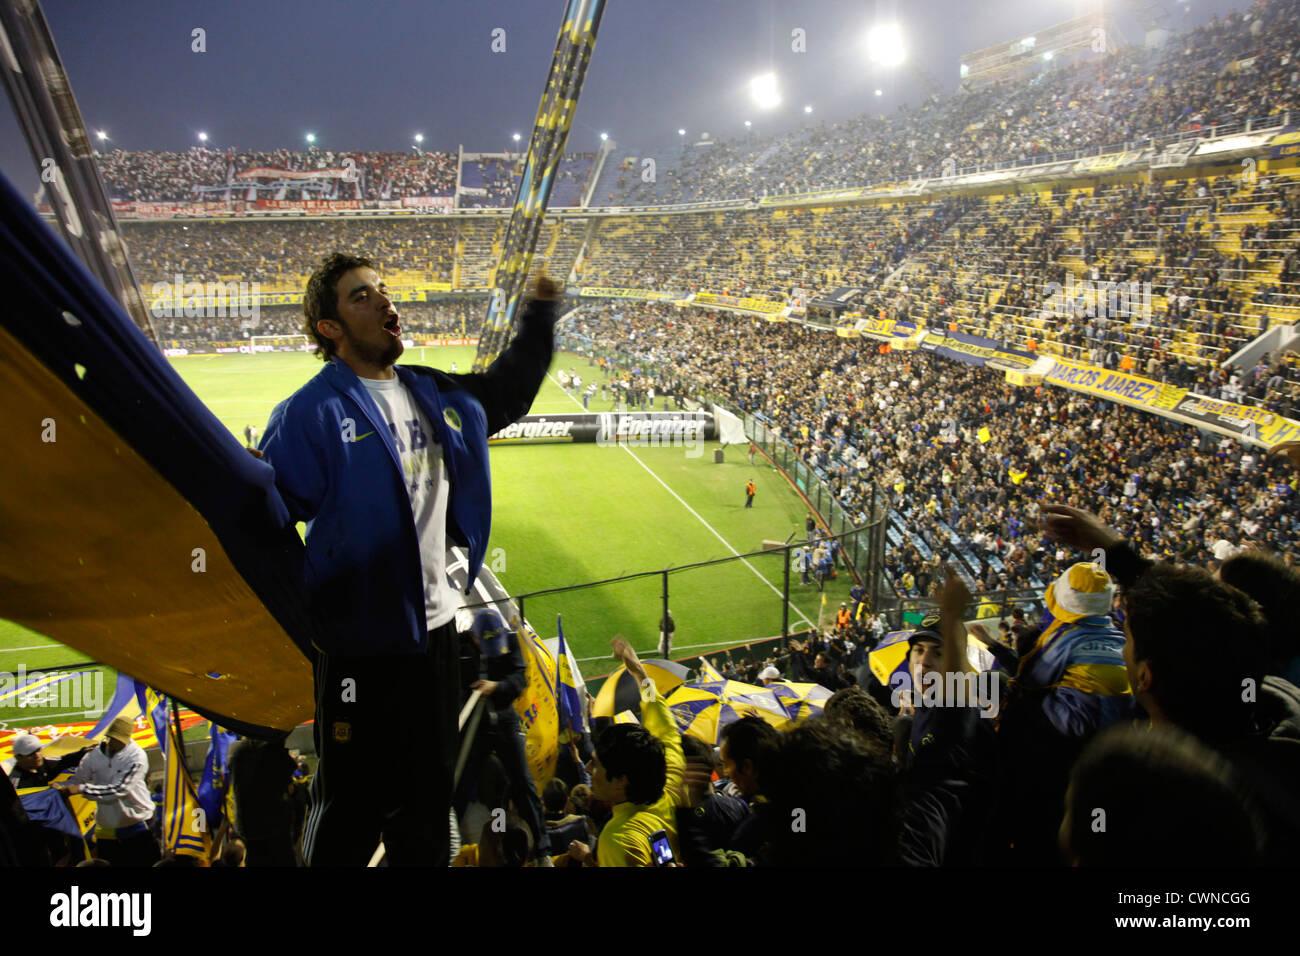 Football match of Boca Juniors at the Bombonera stadium, La Boca, Buenos Aires, Argentina. - Stock Image